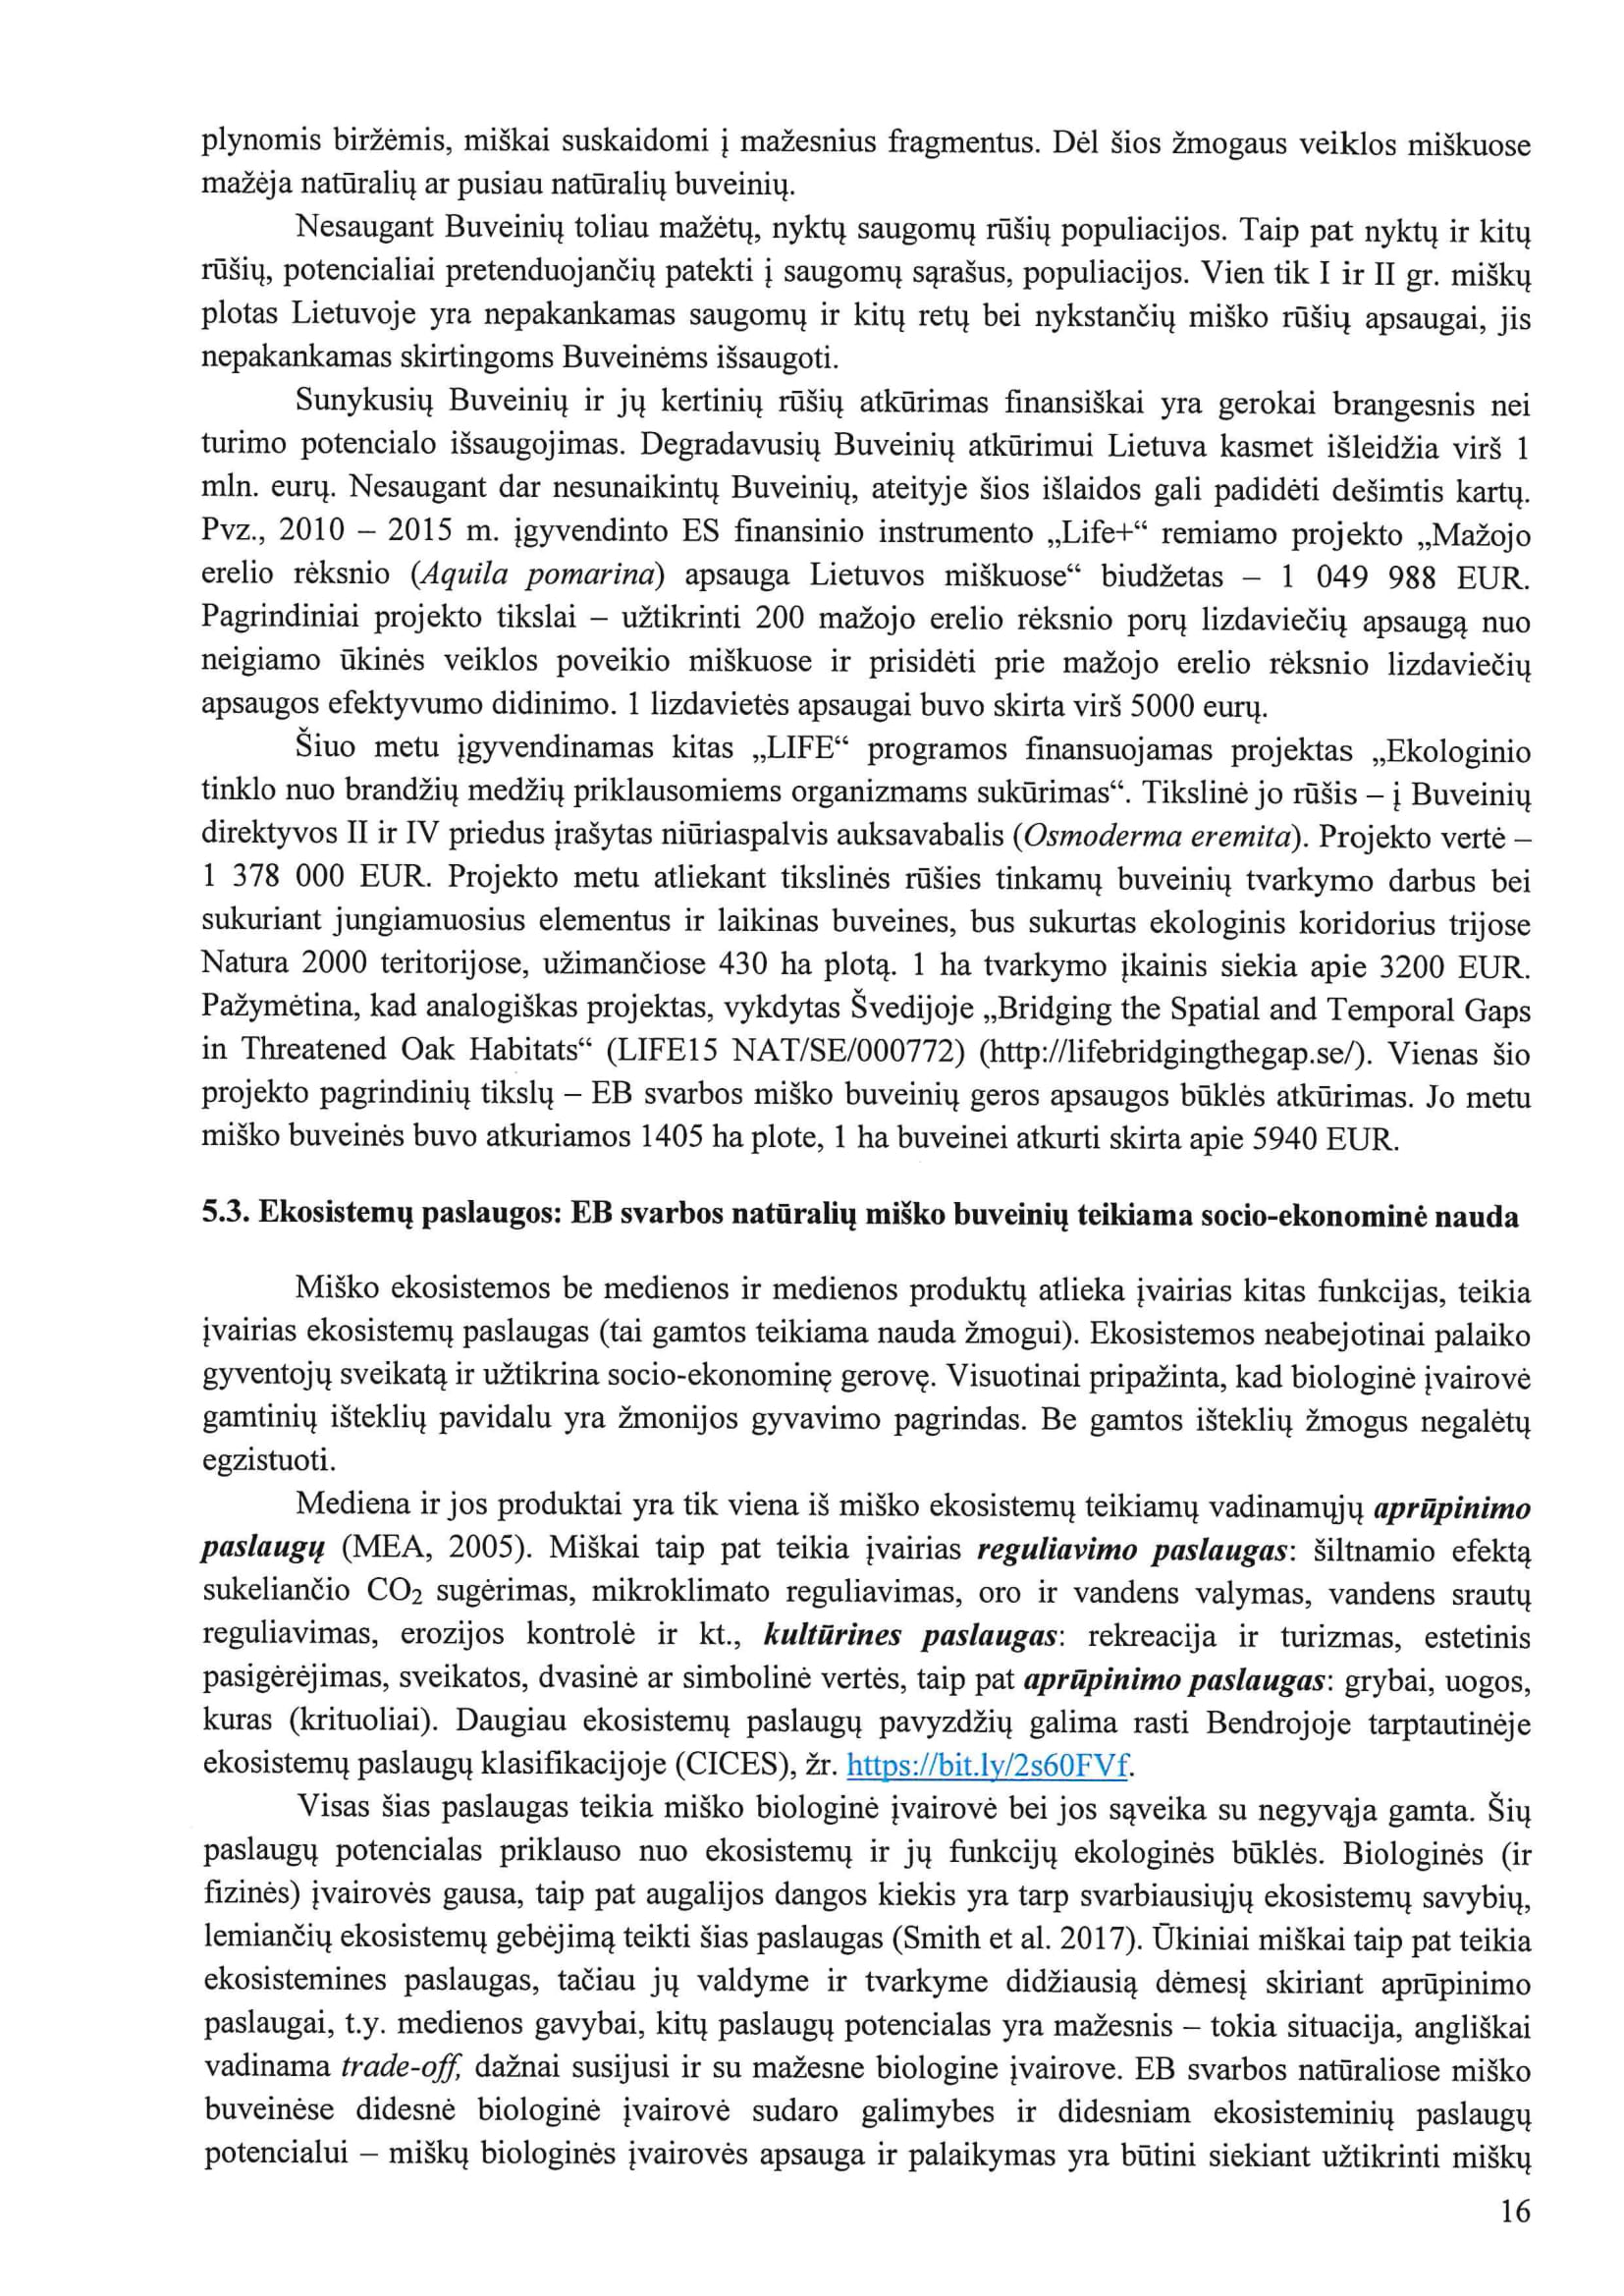 EB buveiniu Pazyma VMT VMU VSTT 2019.01.23 (su parasais)[38073]-16